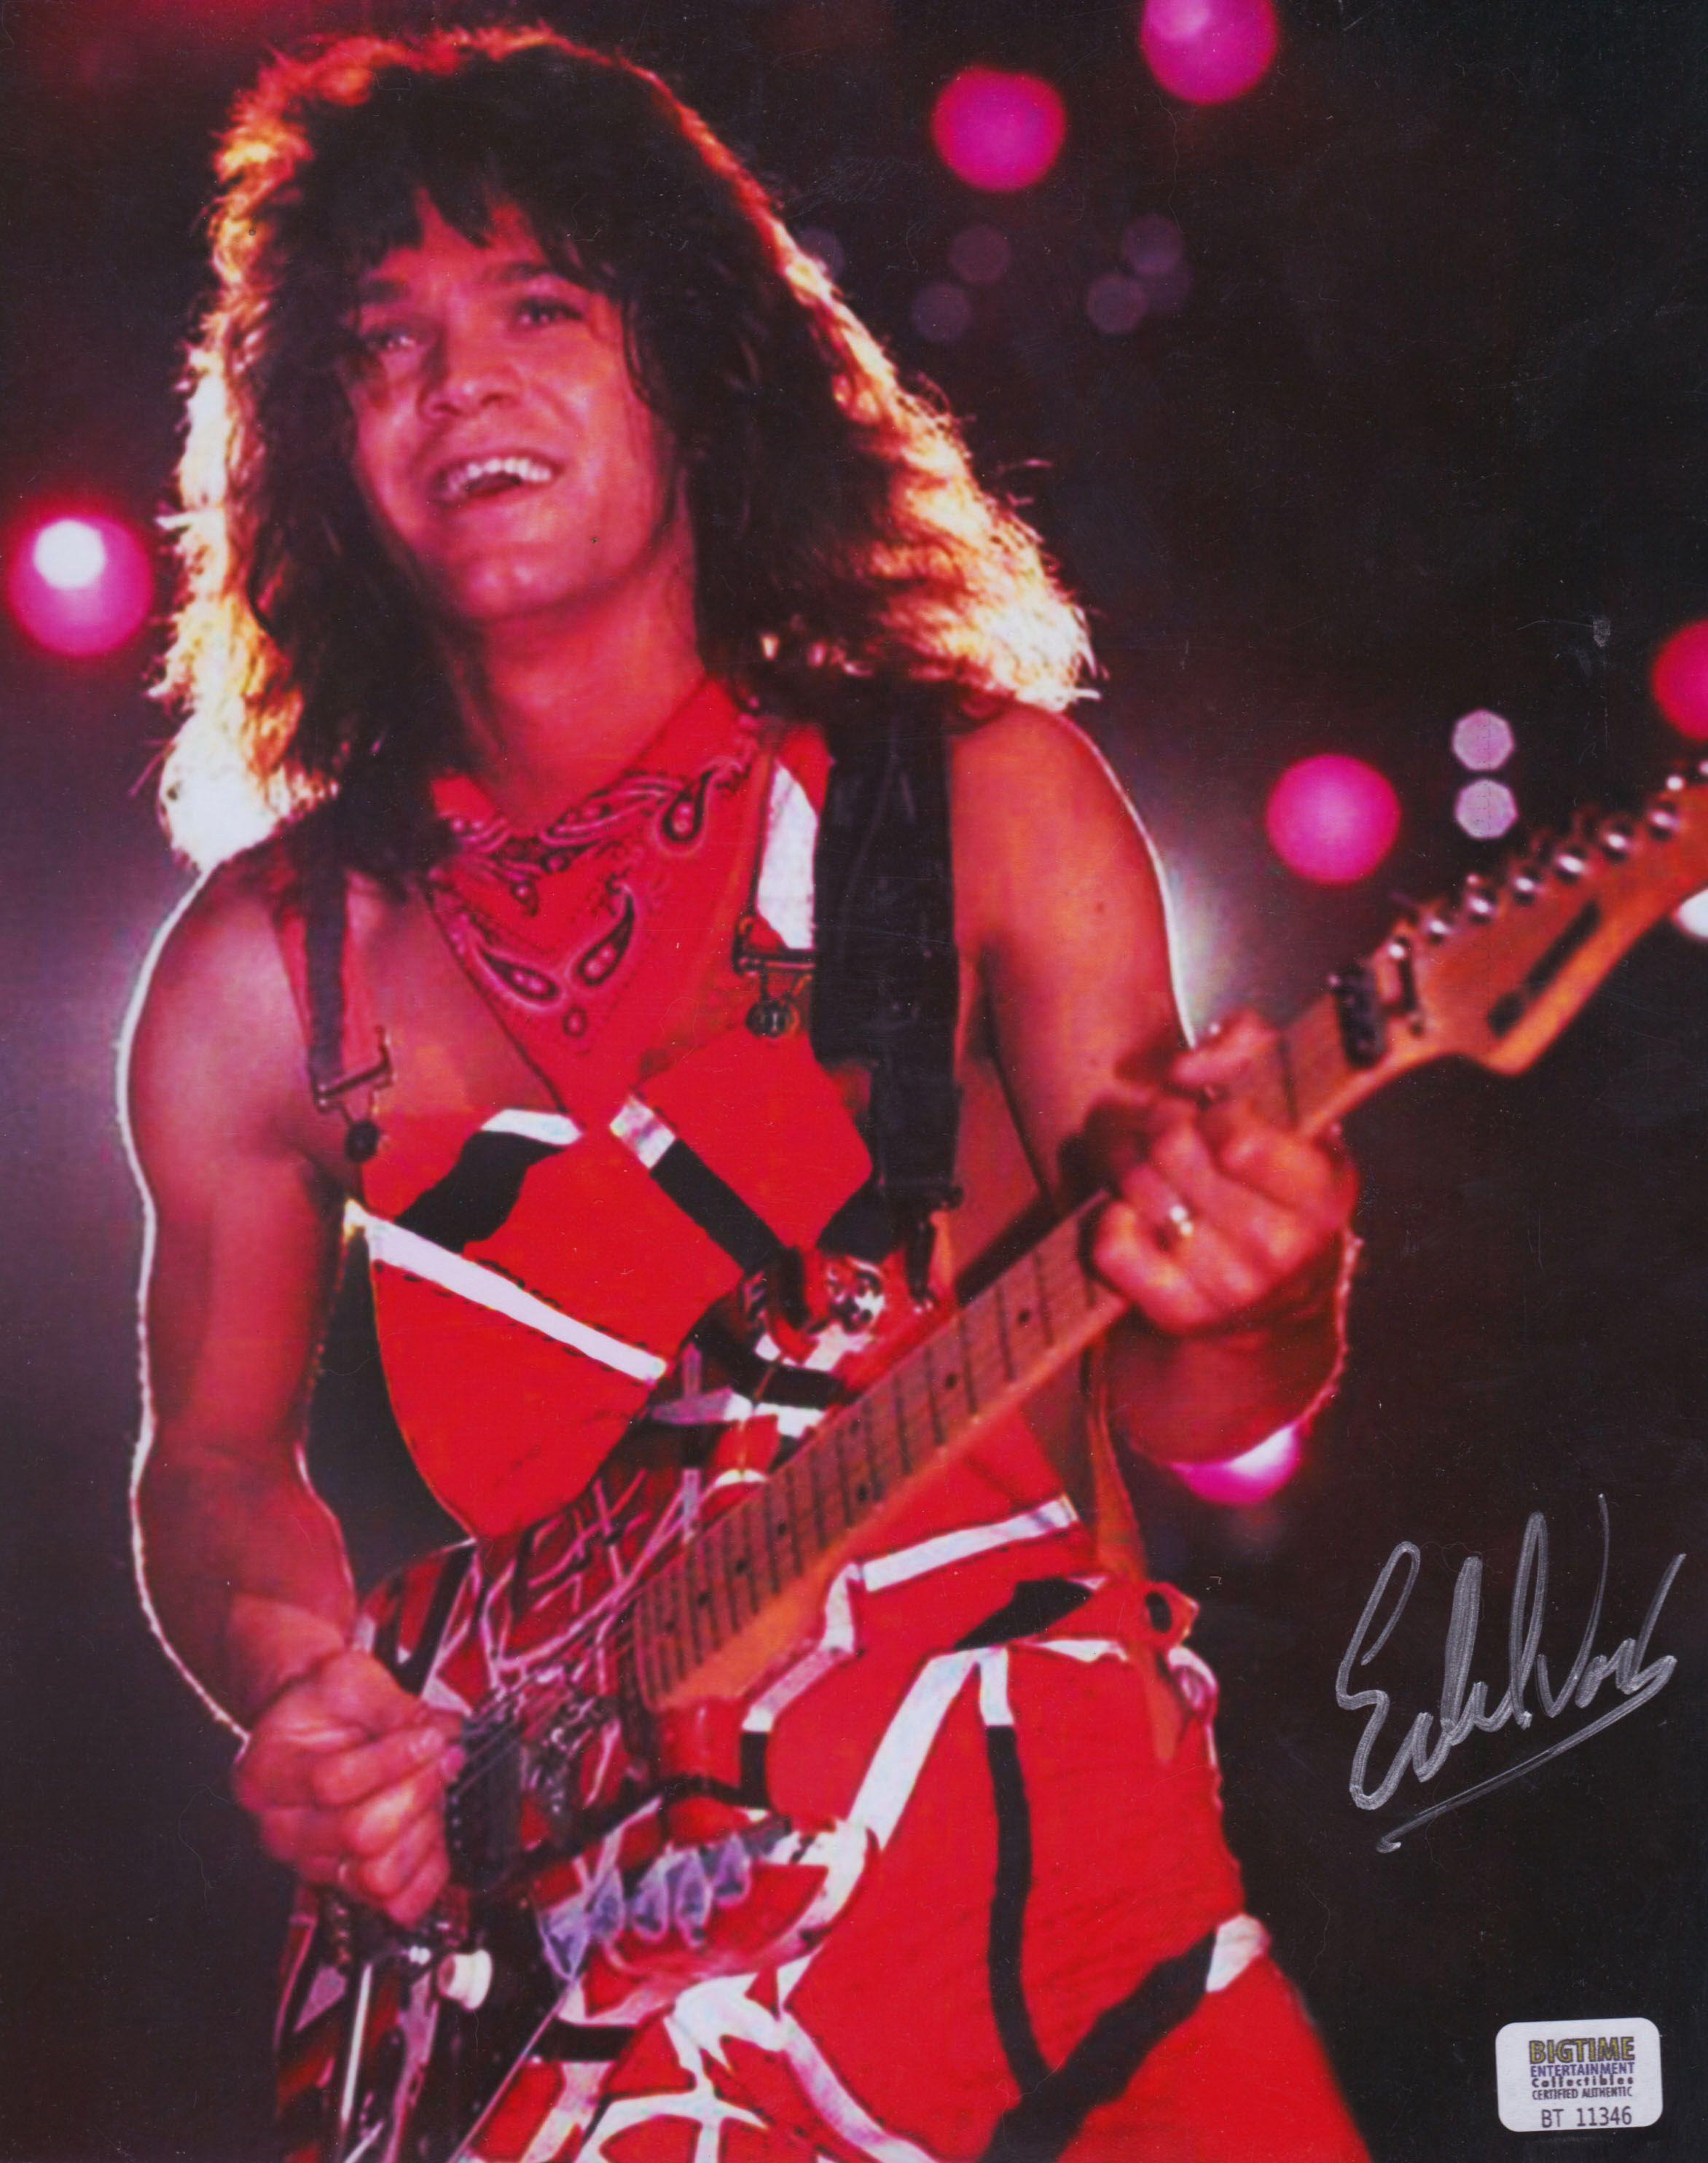 Eddie Van Halen Poster 1983 Van Halen Eddie Van Halen Halen